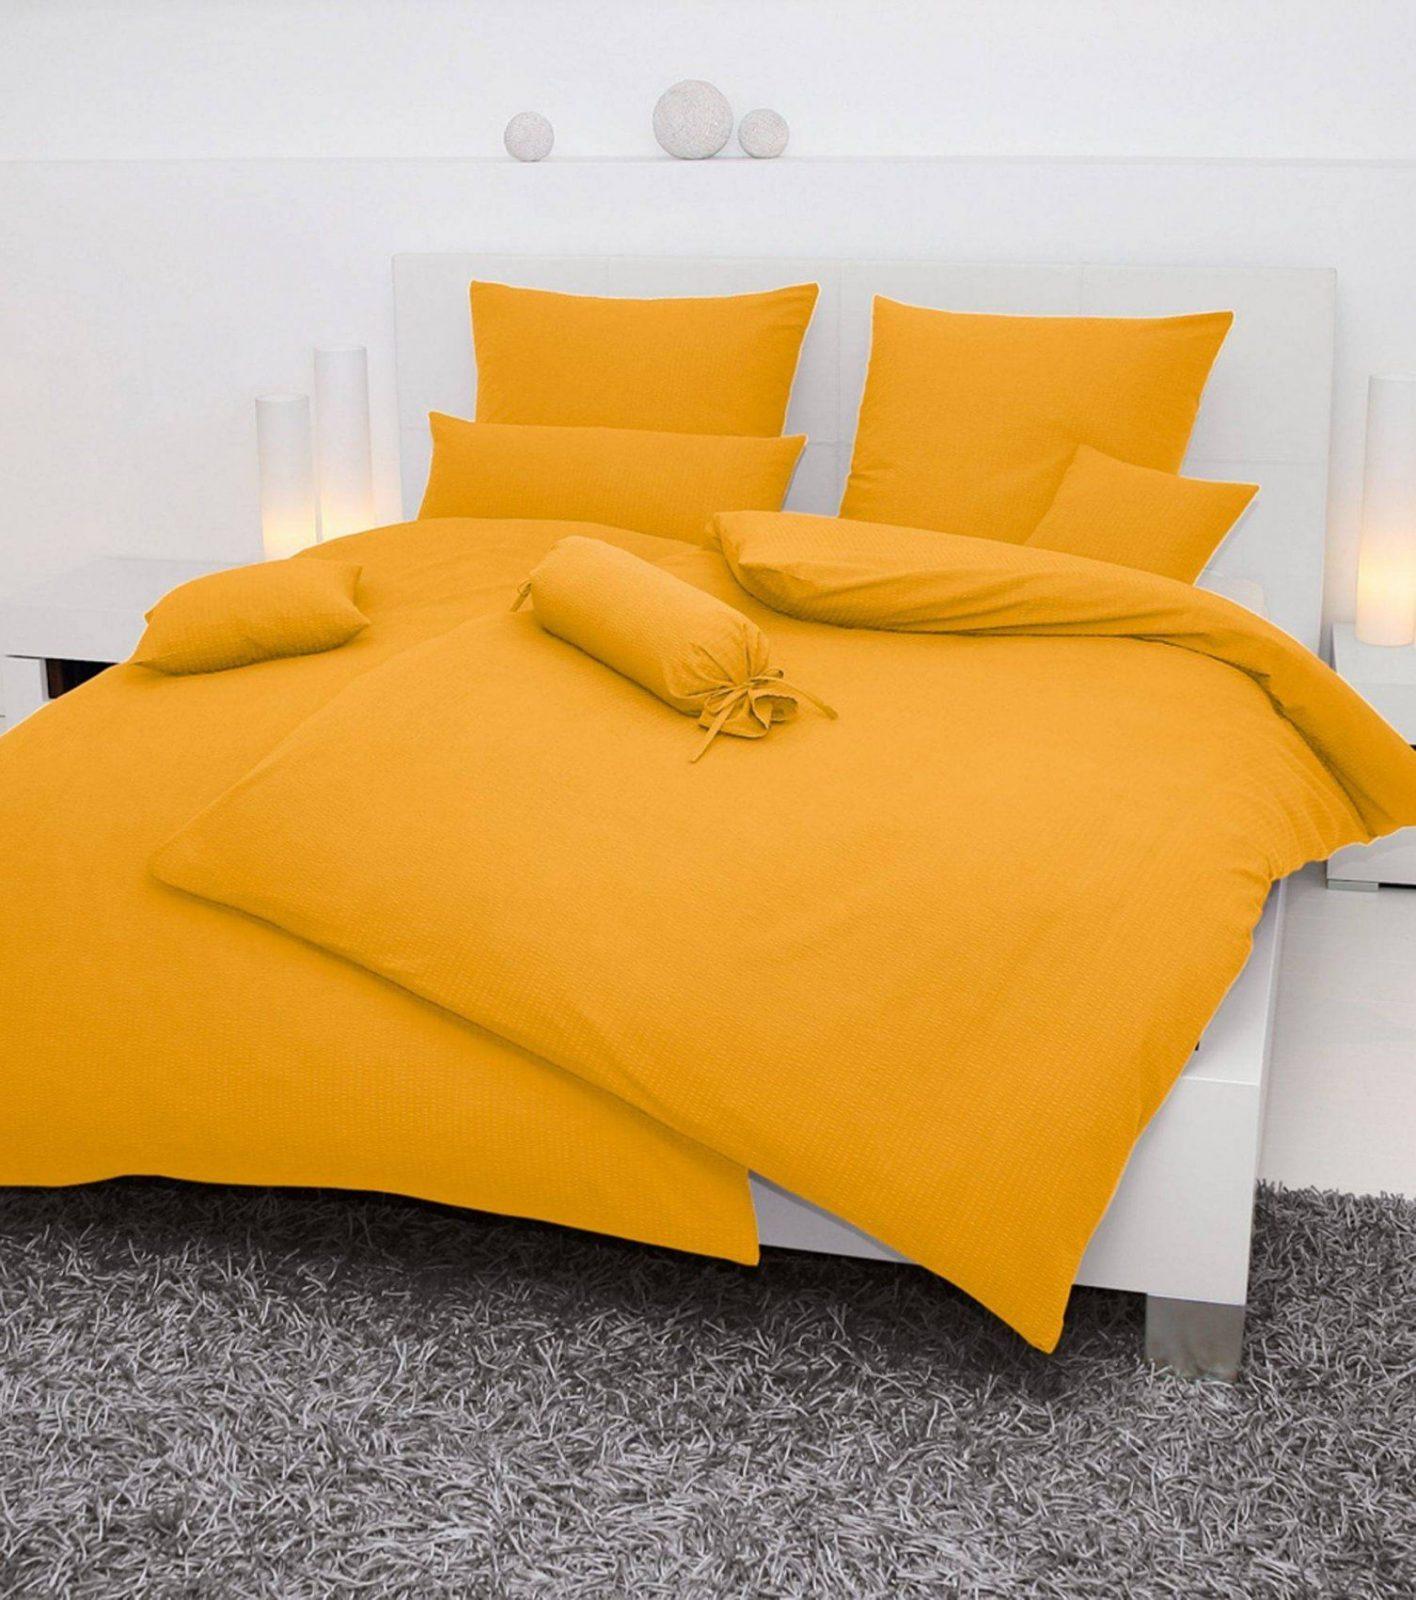 qvc bettw sche 155x220 haus design ideen. Black Bedroom Furniture Sets. Home Design Ideas